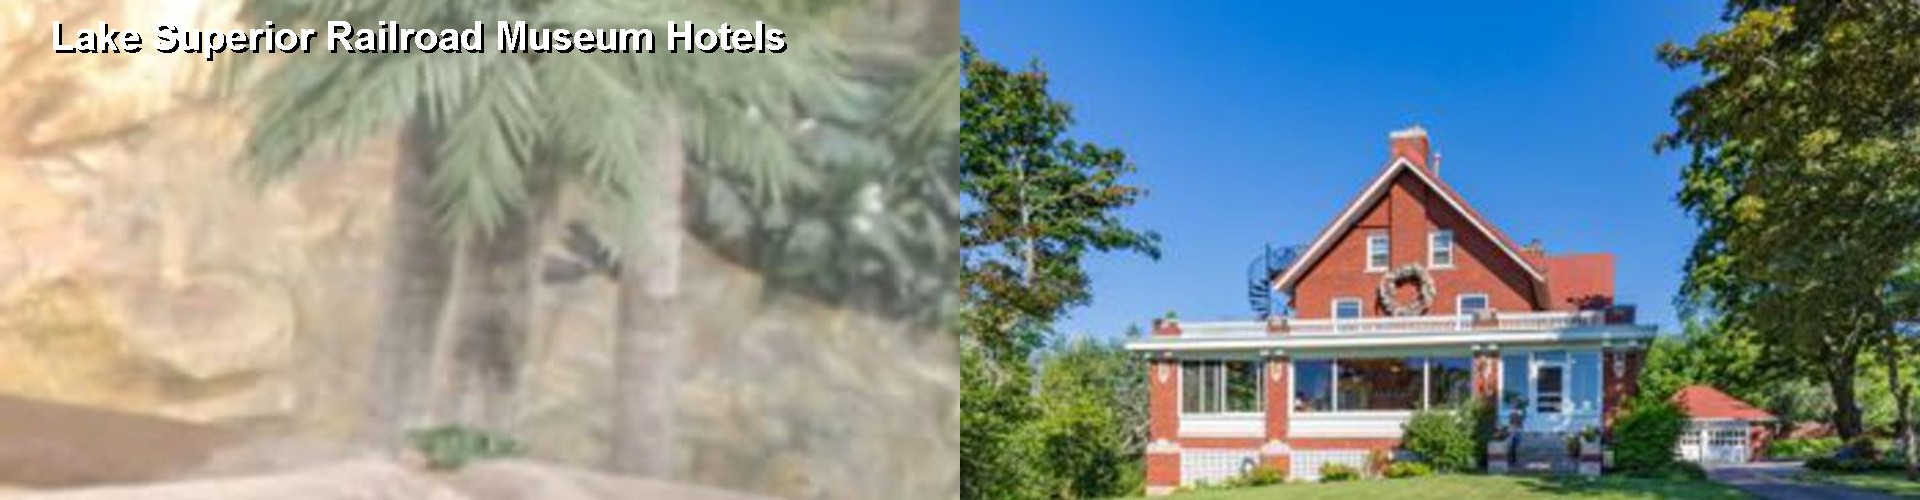 5 Best Hotels Near Lake Superior Railroad Museum